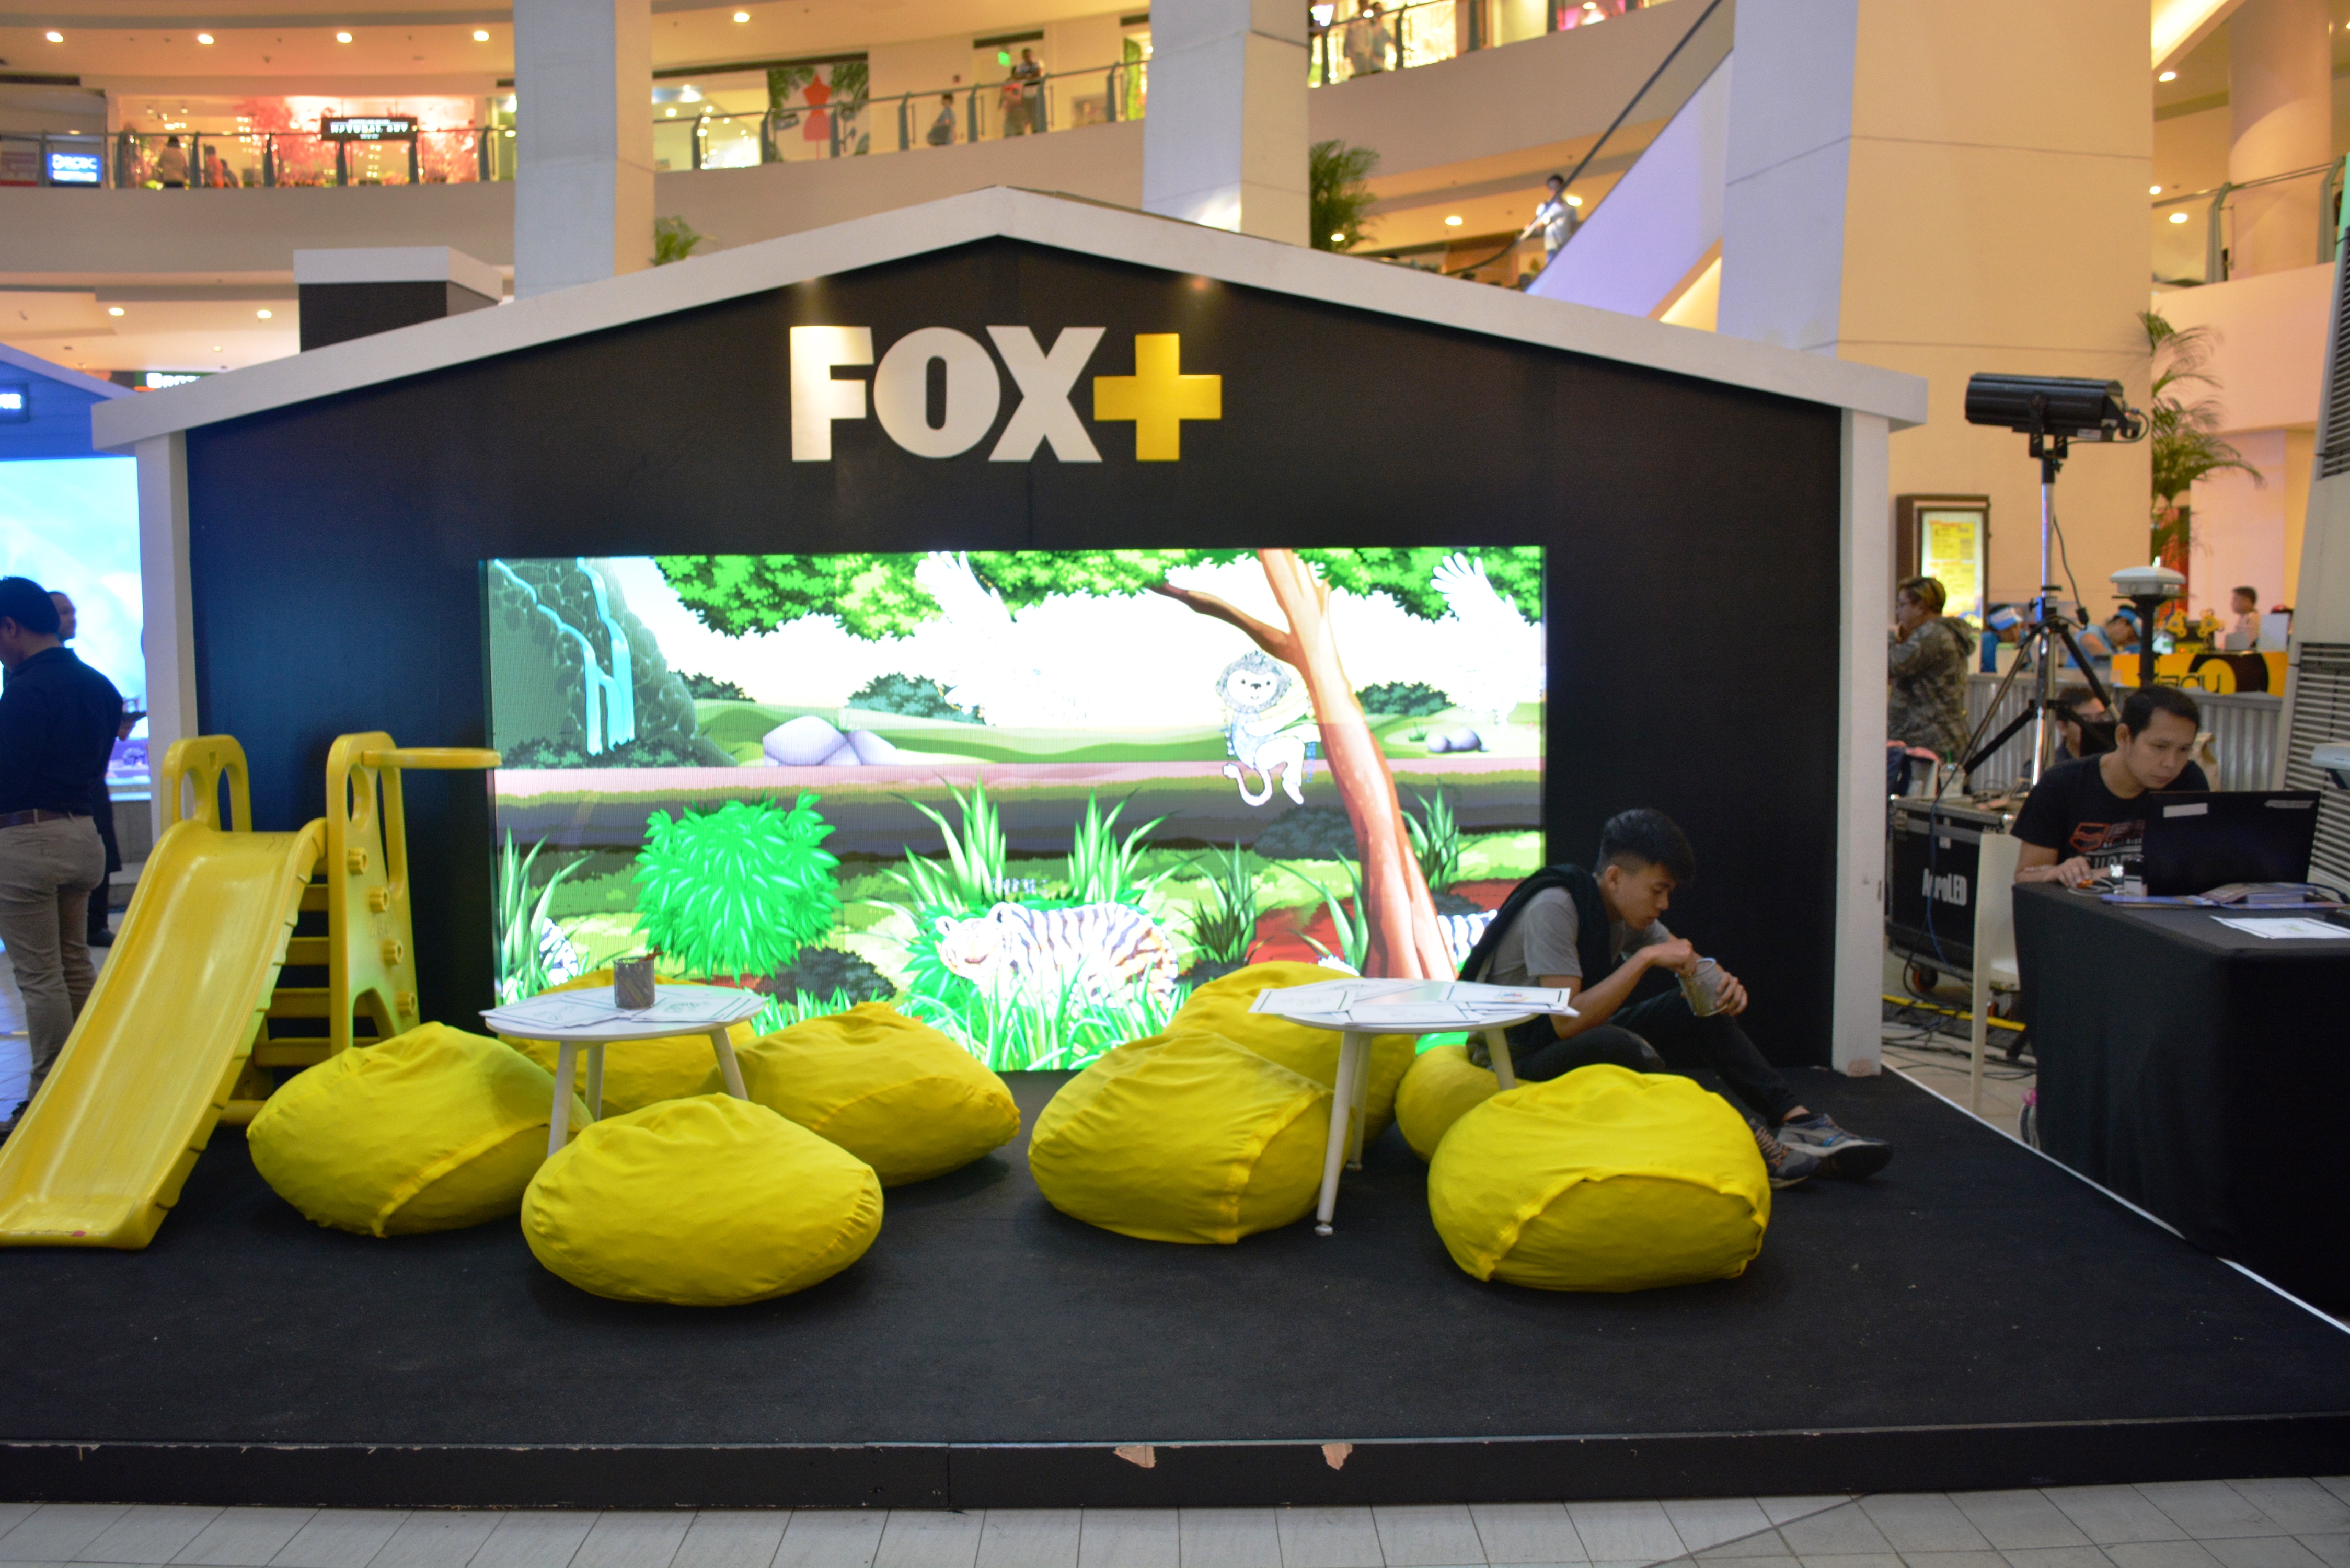 fox+, globe at home, hooq, internet, netflix, postpaid plans, viu